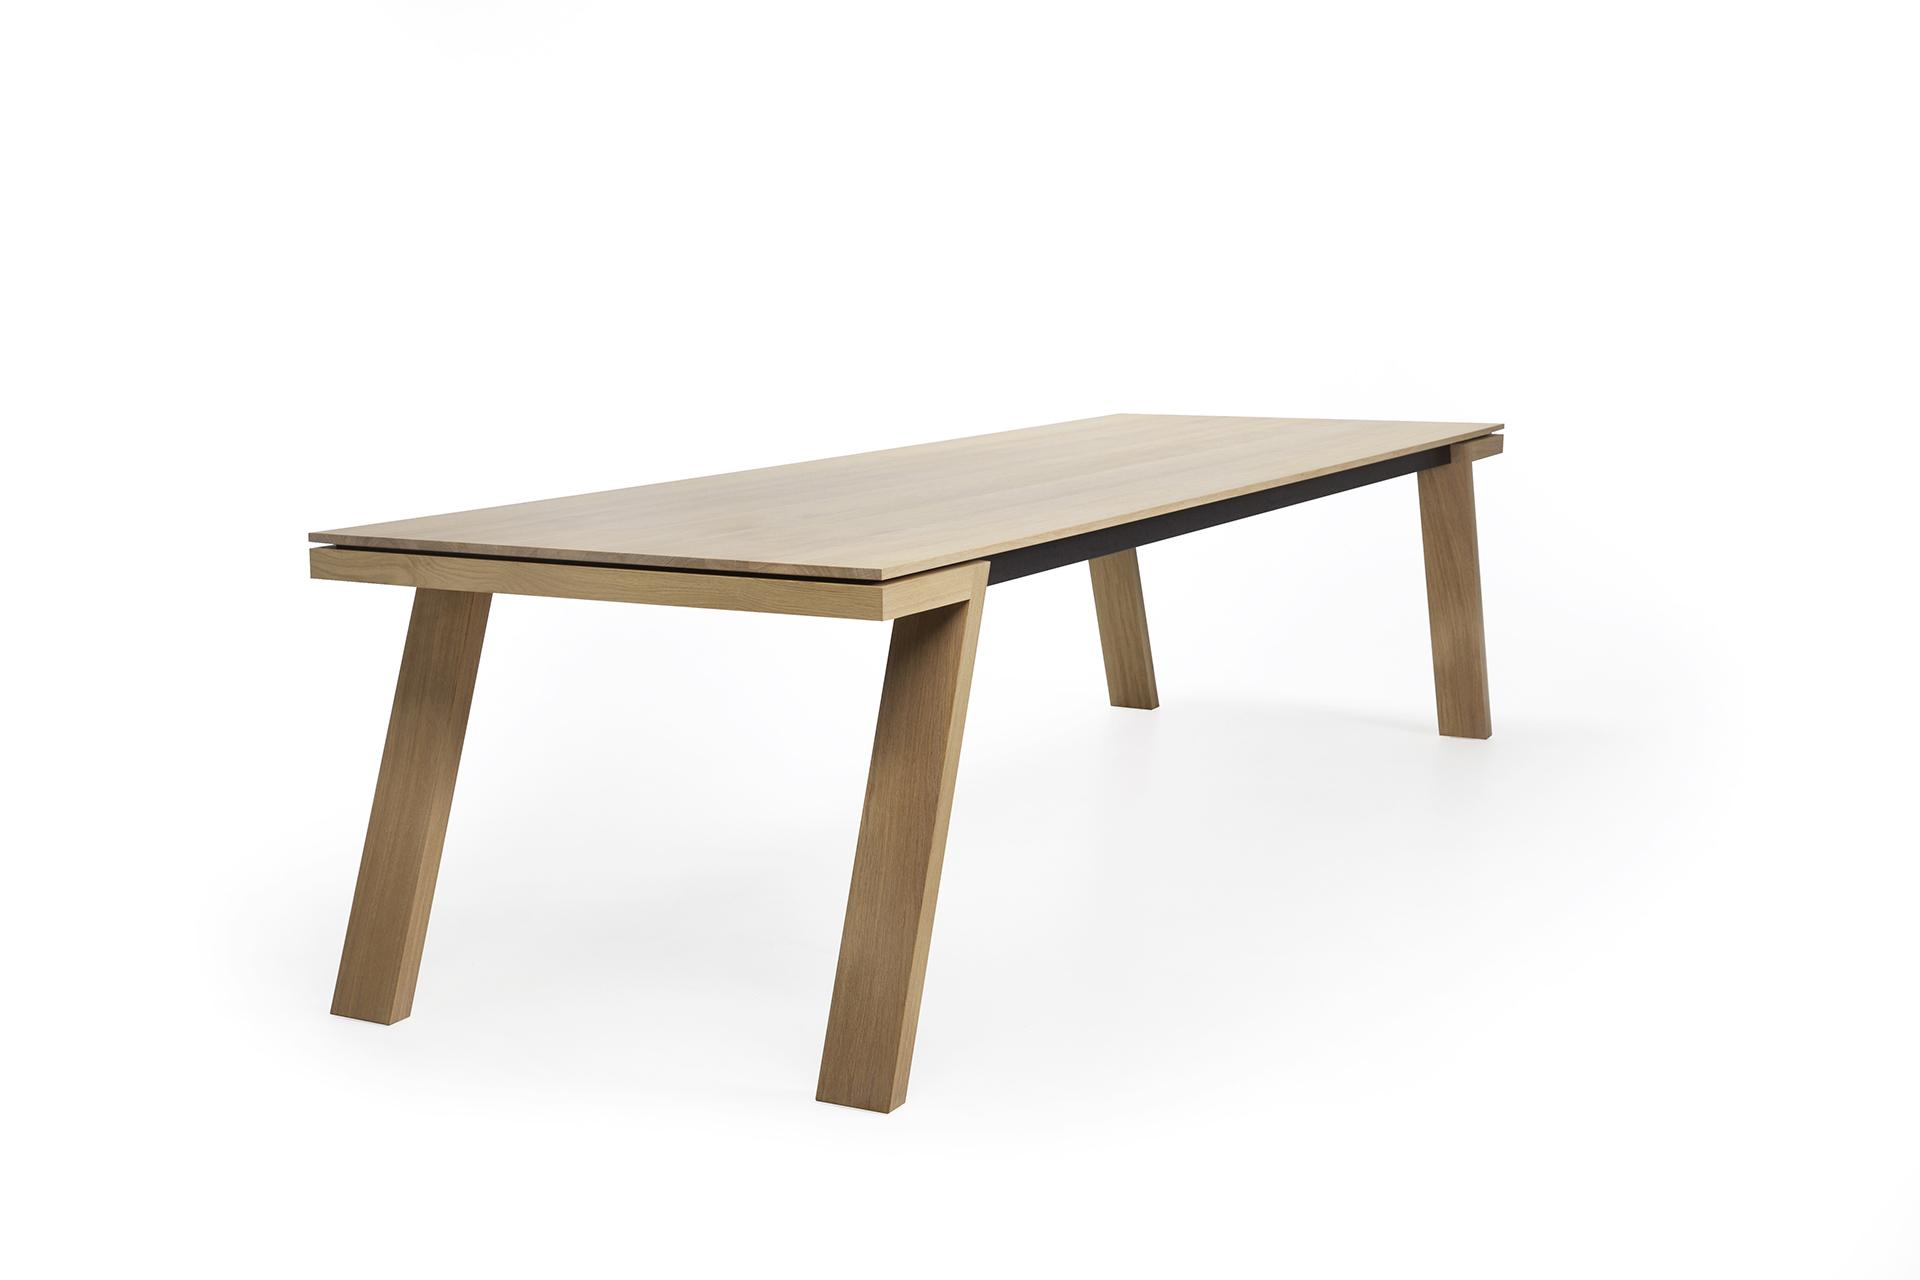 Eettafel Hout 8 Personen.Design Eettafel Spring L Kees Marcelis L Odesi Your Dutch Design